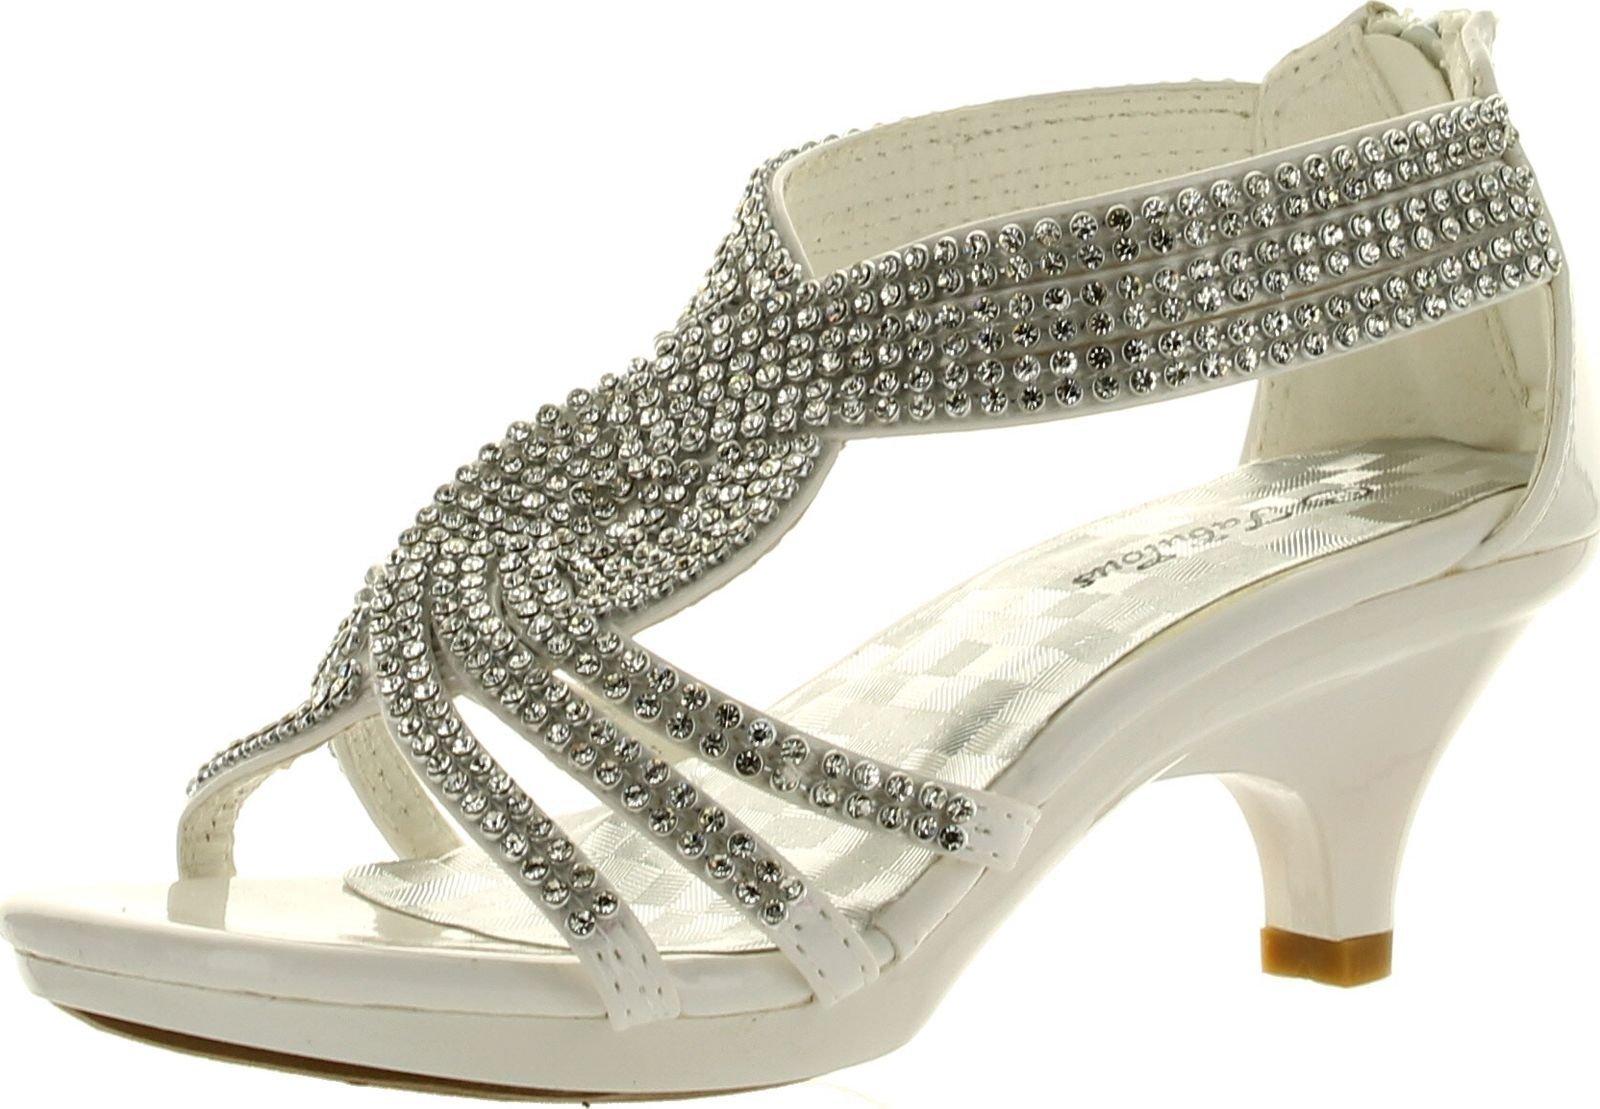 JJF Shoes Angel-37 Kids White Little Girls Bling Rhinestone Platform Dress Heels Sandals-13